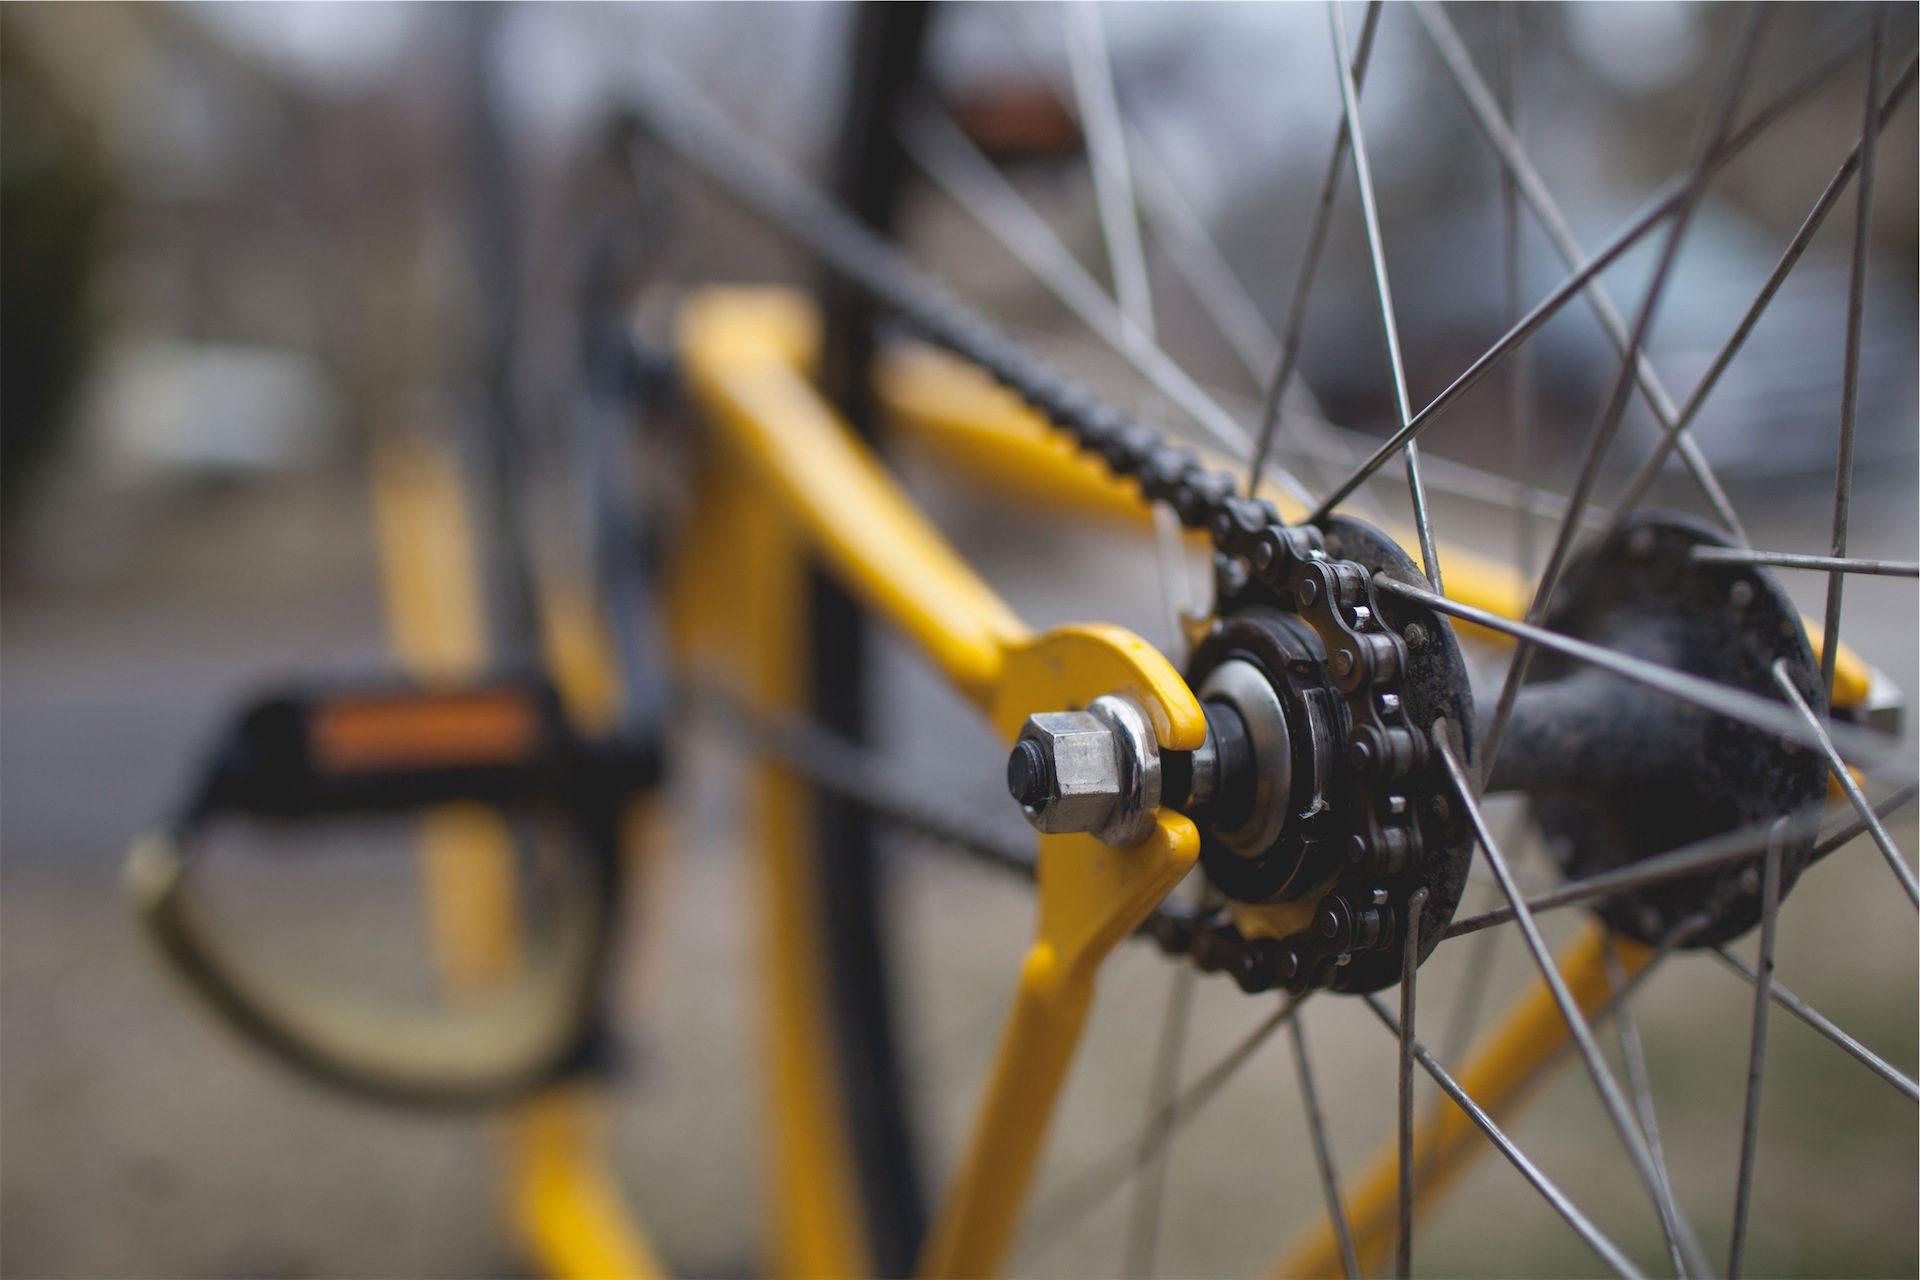 बाइक, पहिया, चेन, pedal, पीला - HD वॉलपेपर - प्रोफेसर-falken.com